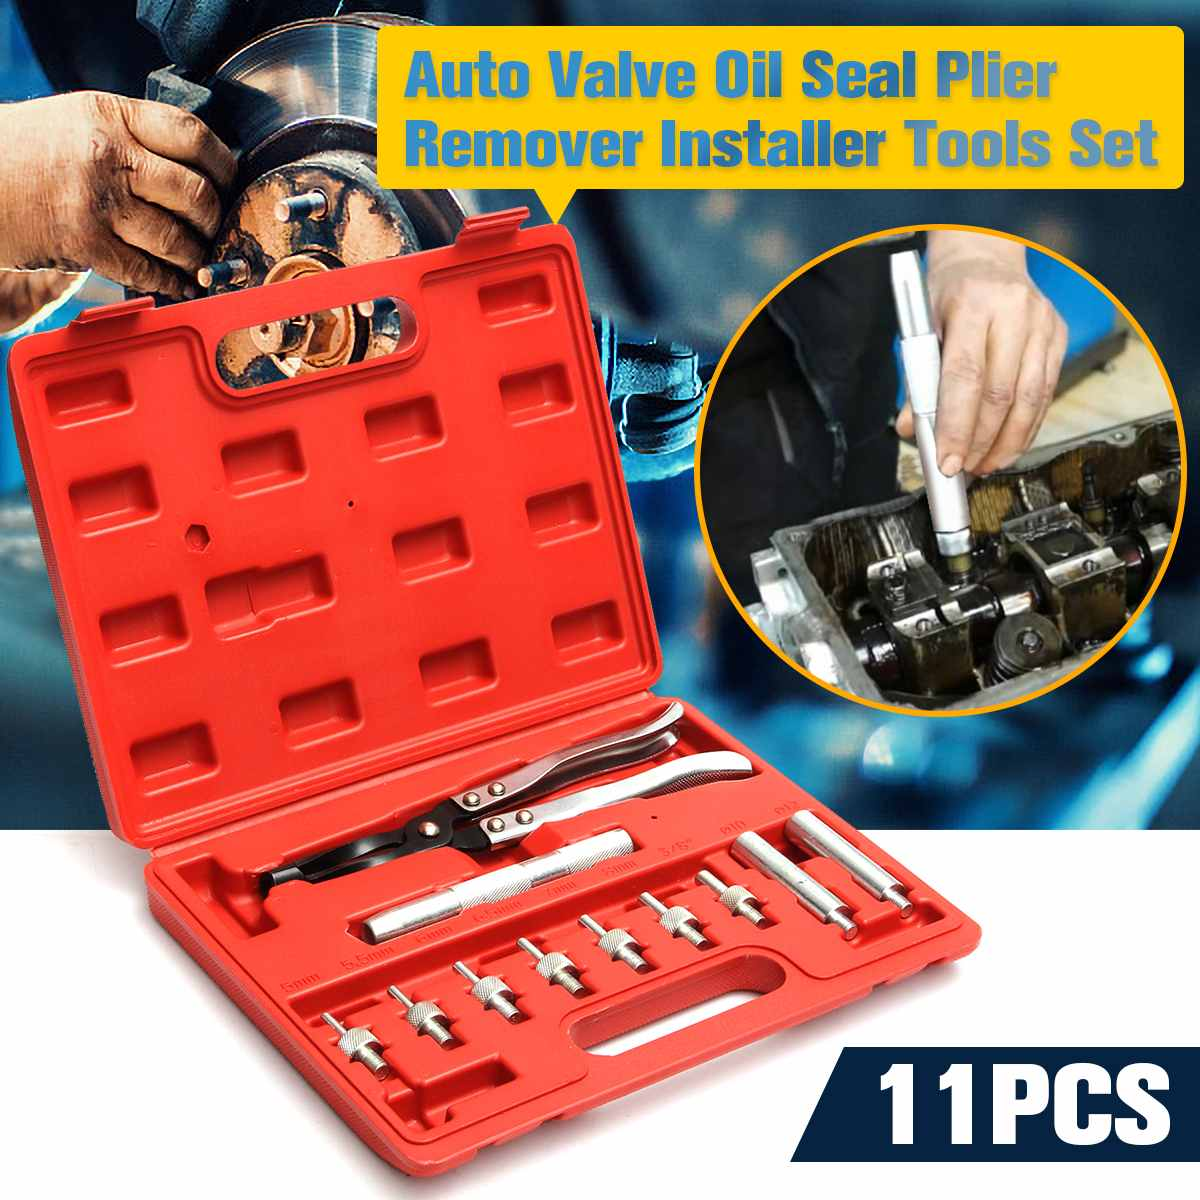 Doersupp 11 In 1 Professional Universal Case 11pcs Auto Valve Stem Seal Plier Seating Pliers Remover Installer Tool Kit Set